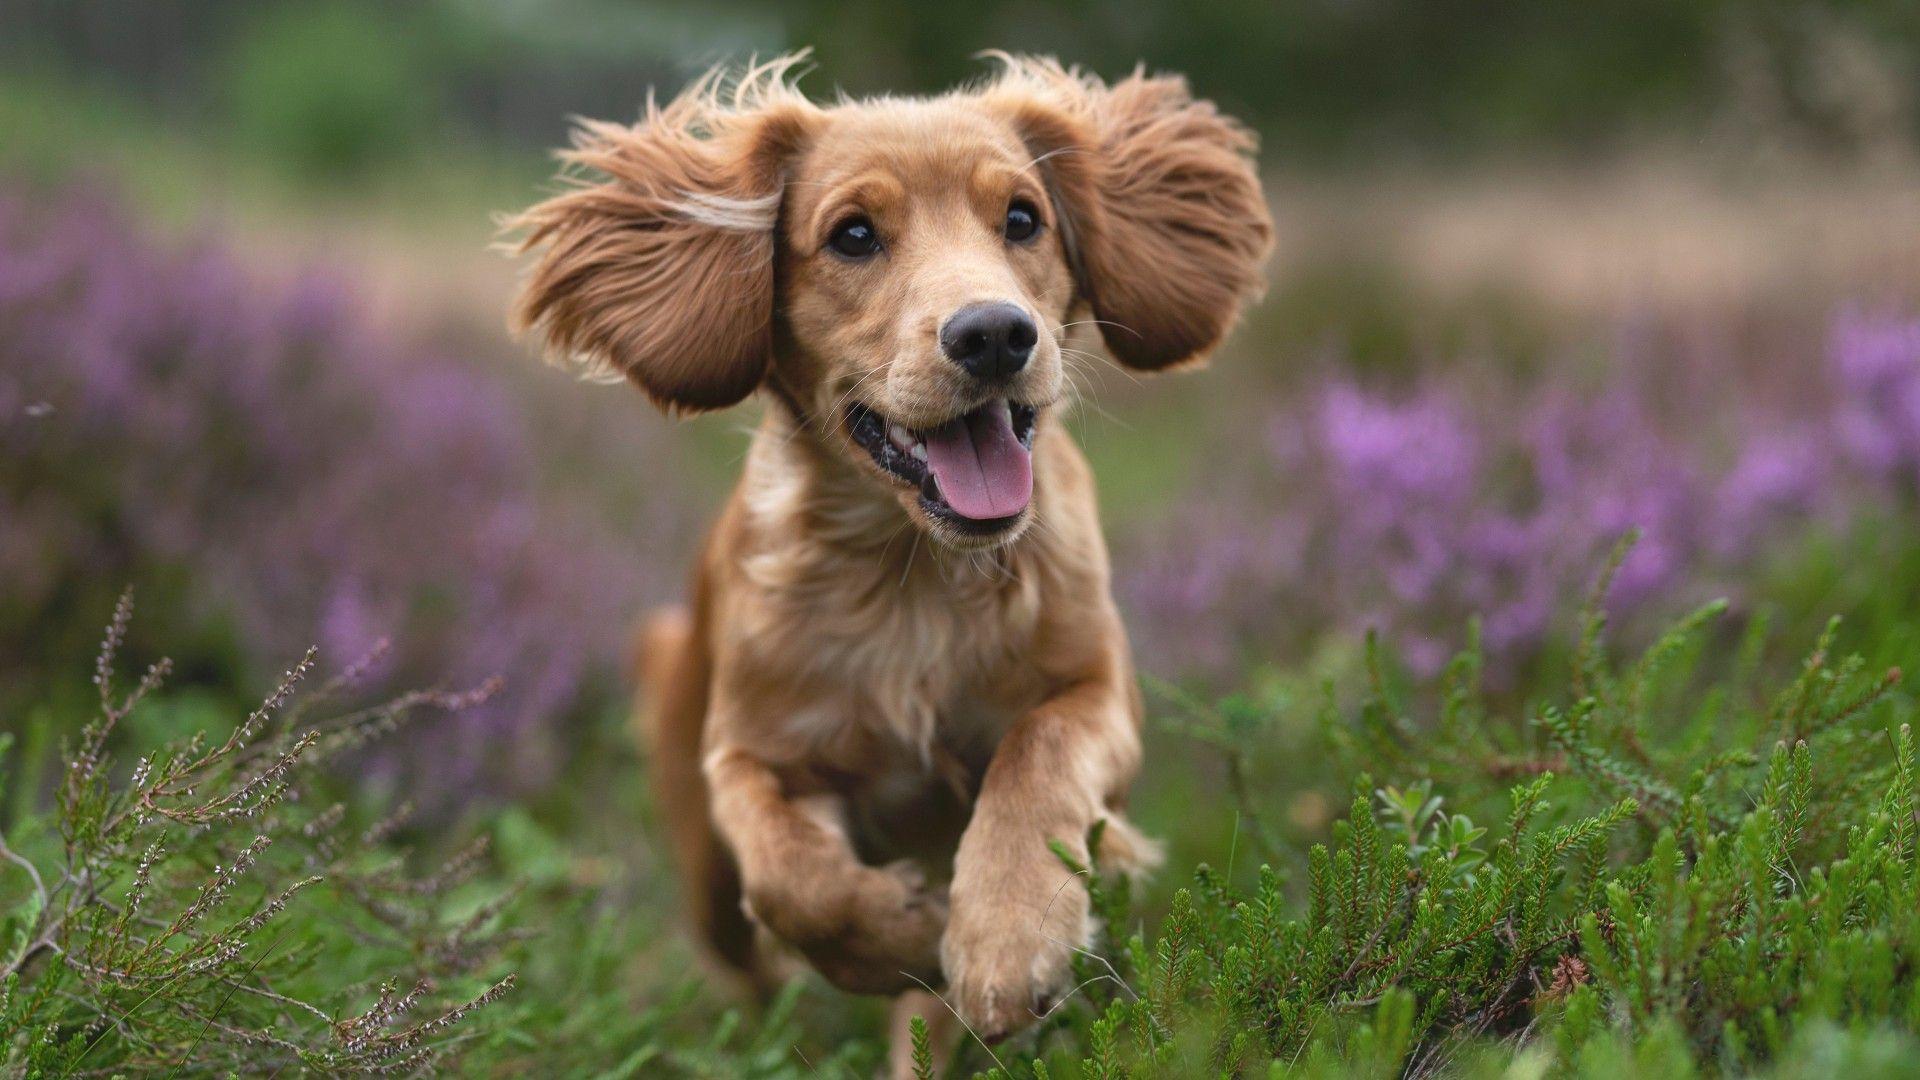 Cute Pets Hd Wallpapers For Desktop 1920 X 1080 Puppy Wallpaper Cute Laptop Wallpaper Cute Dogs